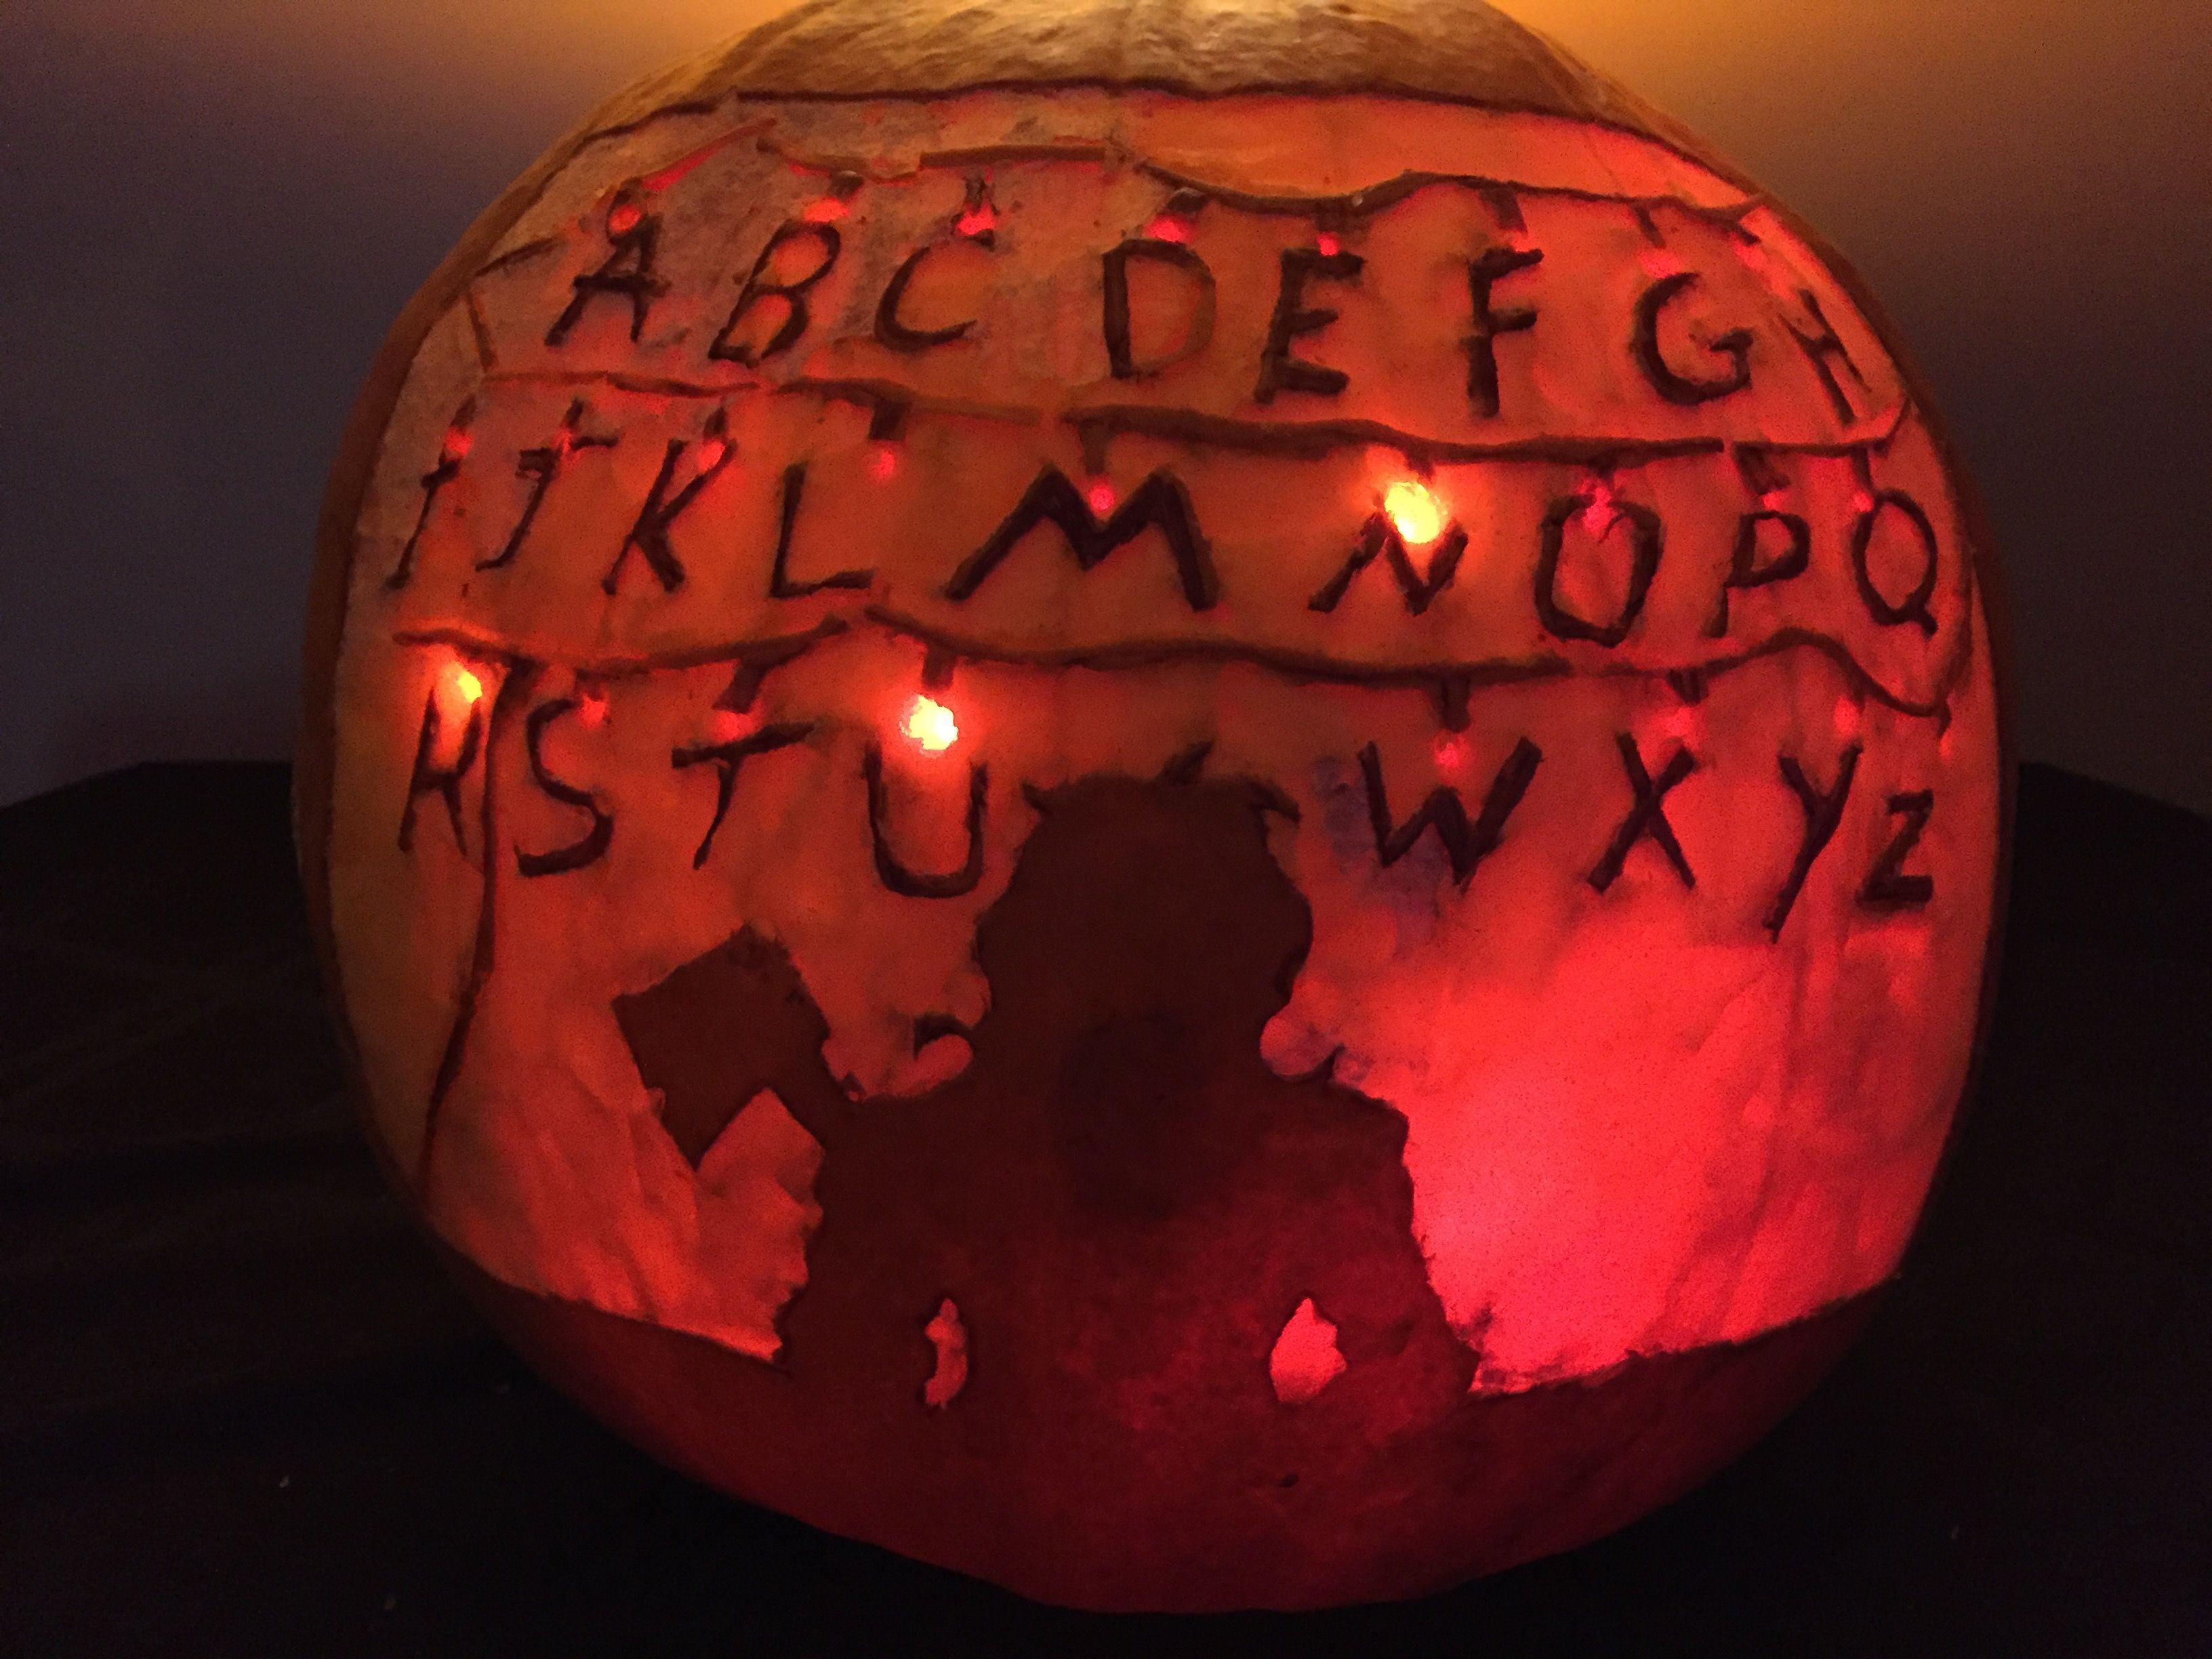 Stranger Things Pumpkin Carving Halloween Pumpkins And Jack O